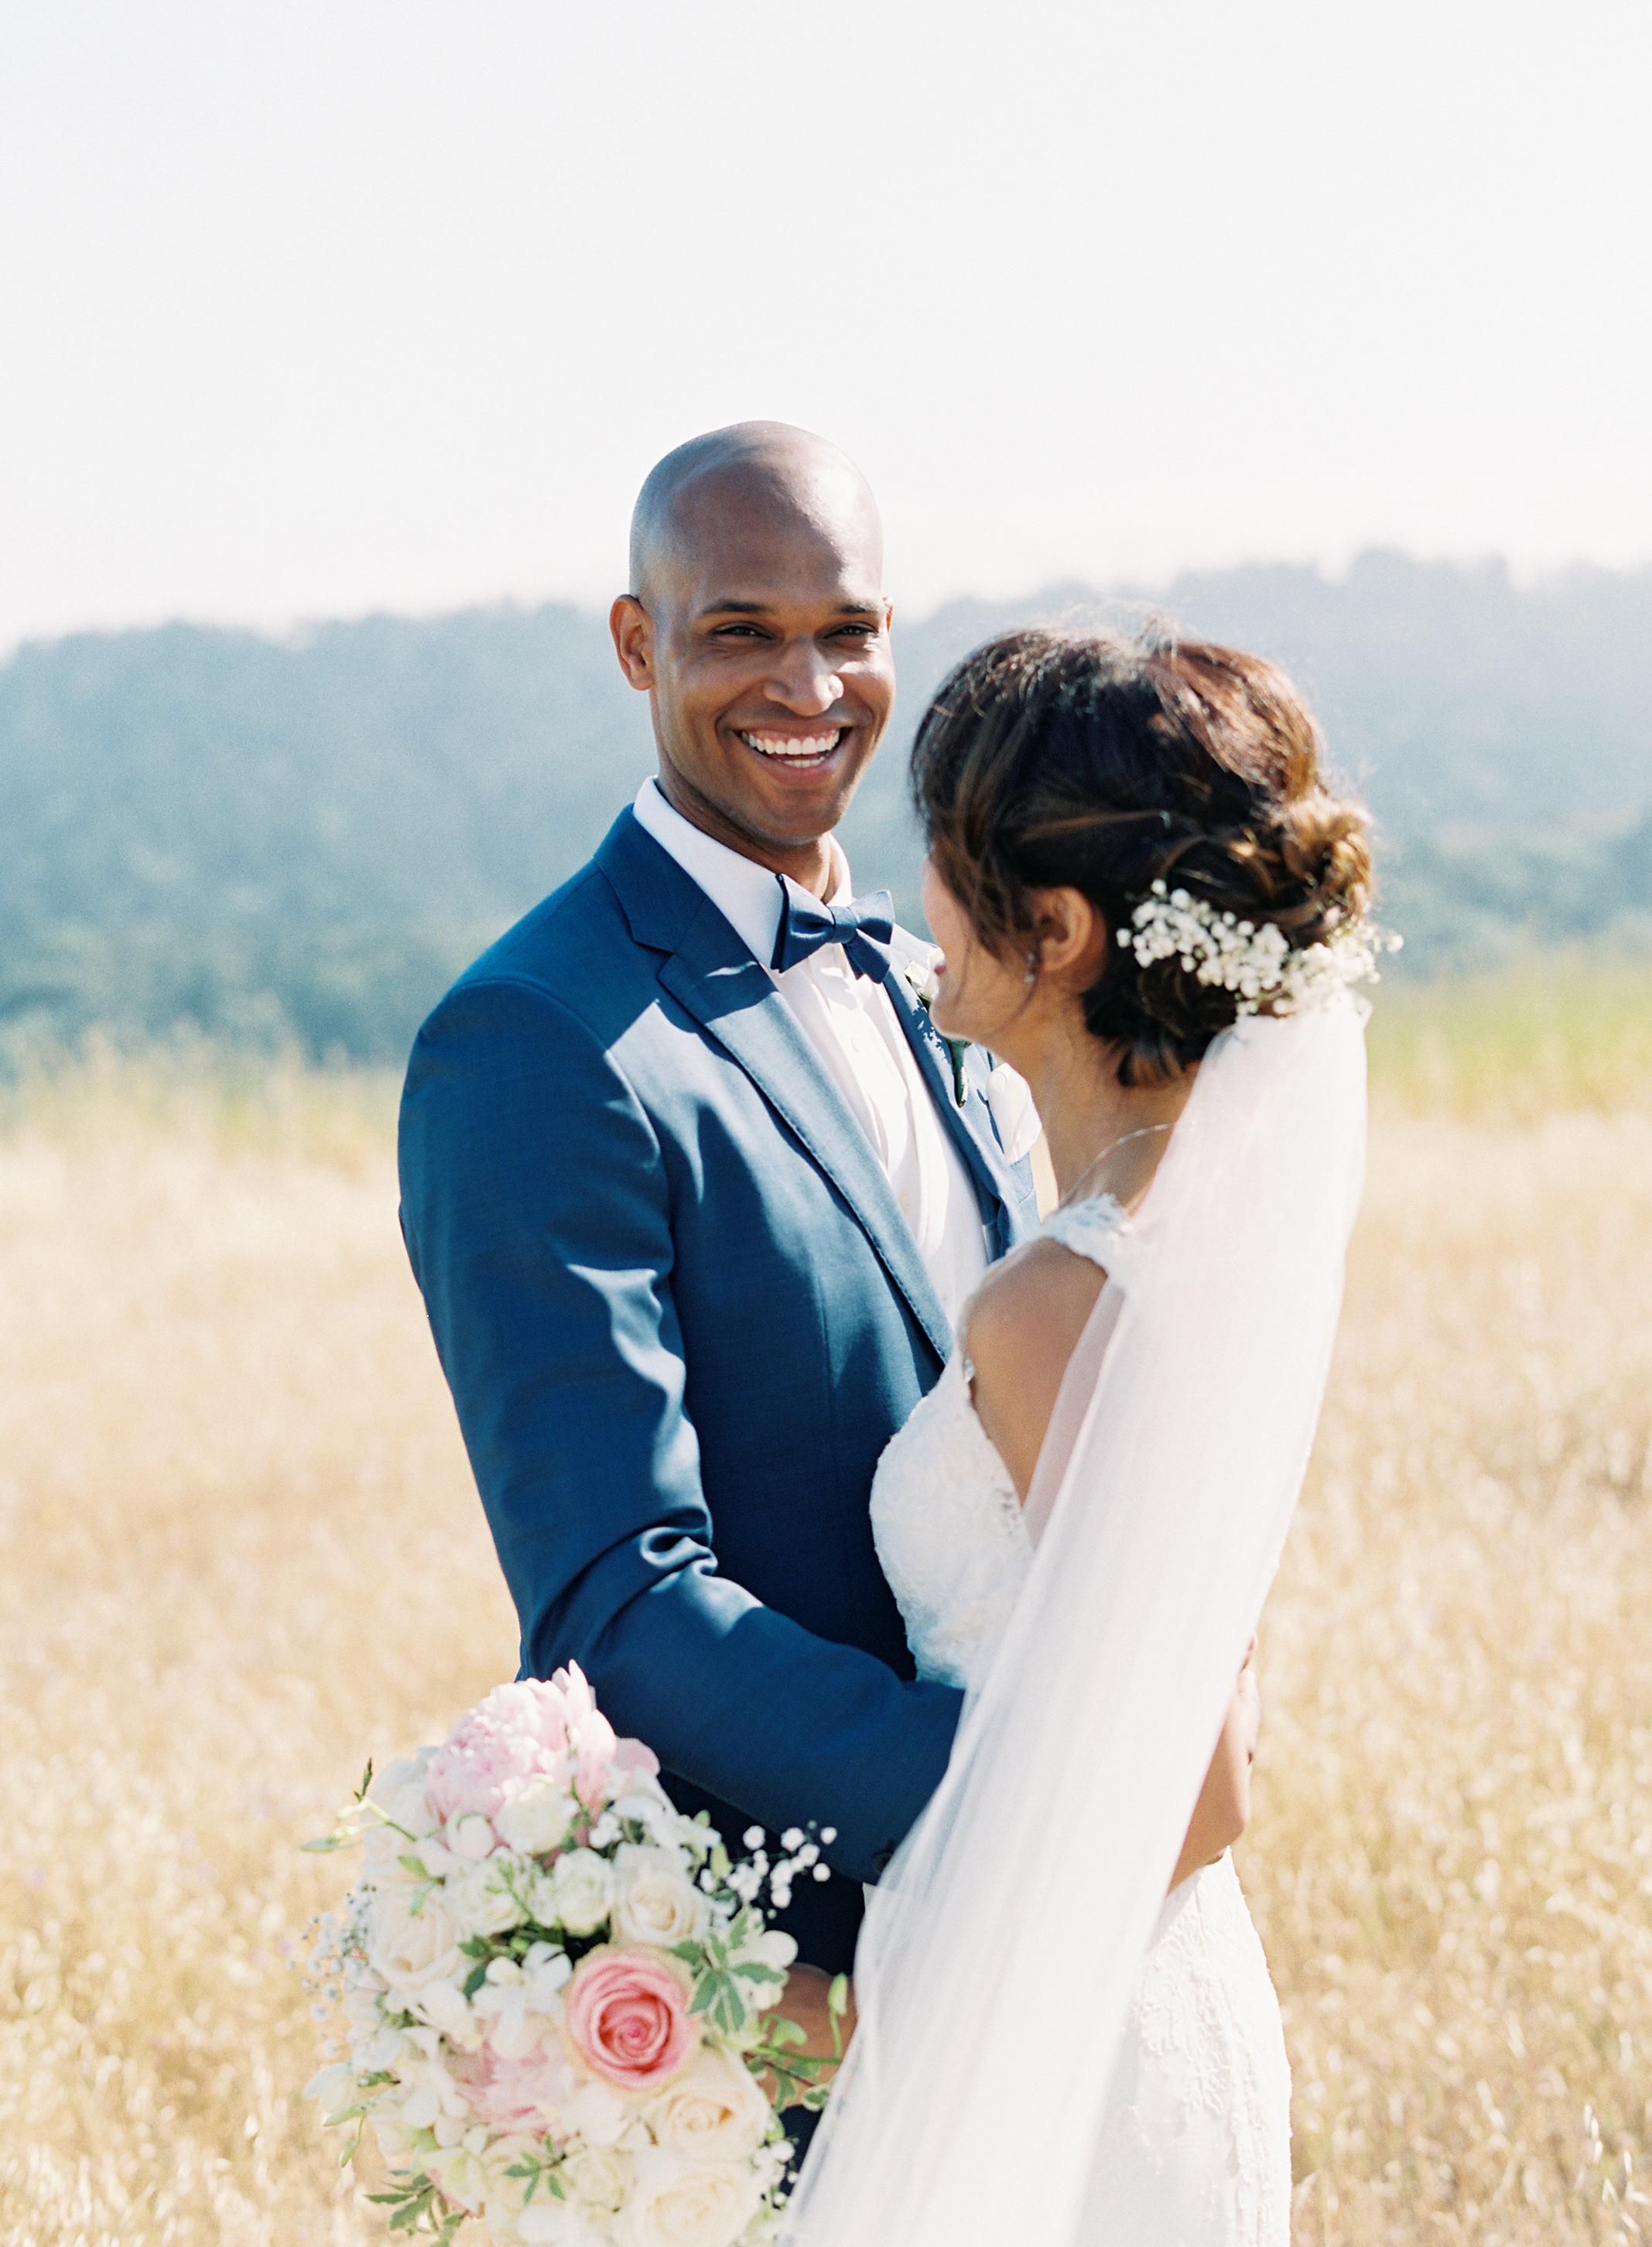 kristine-herman-photography-wedgewood-wedding46.jpg